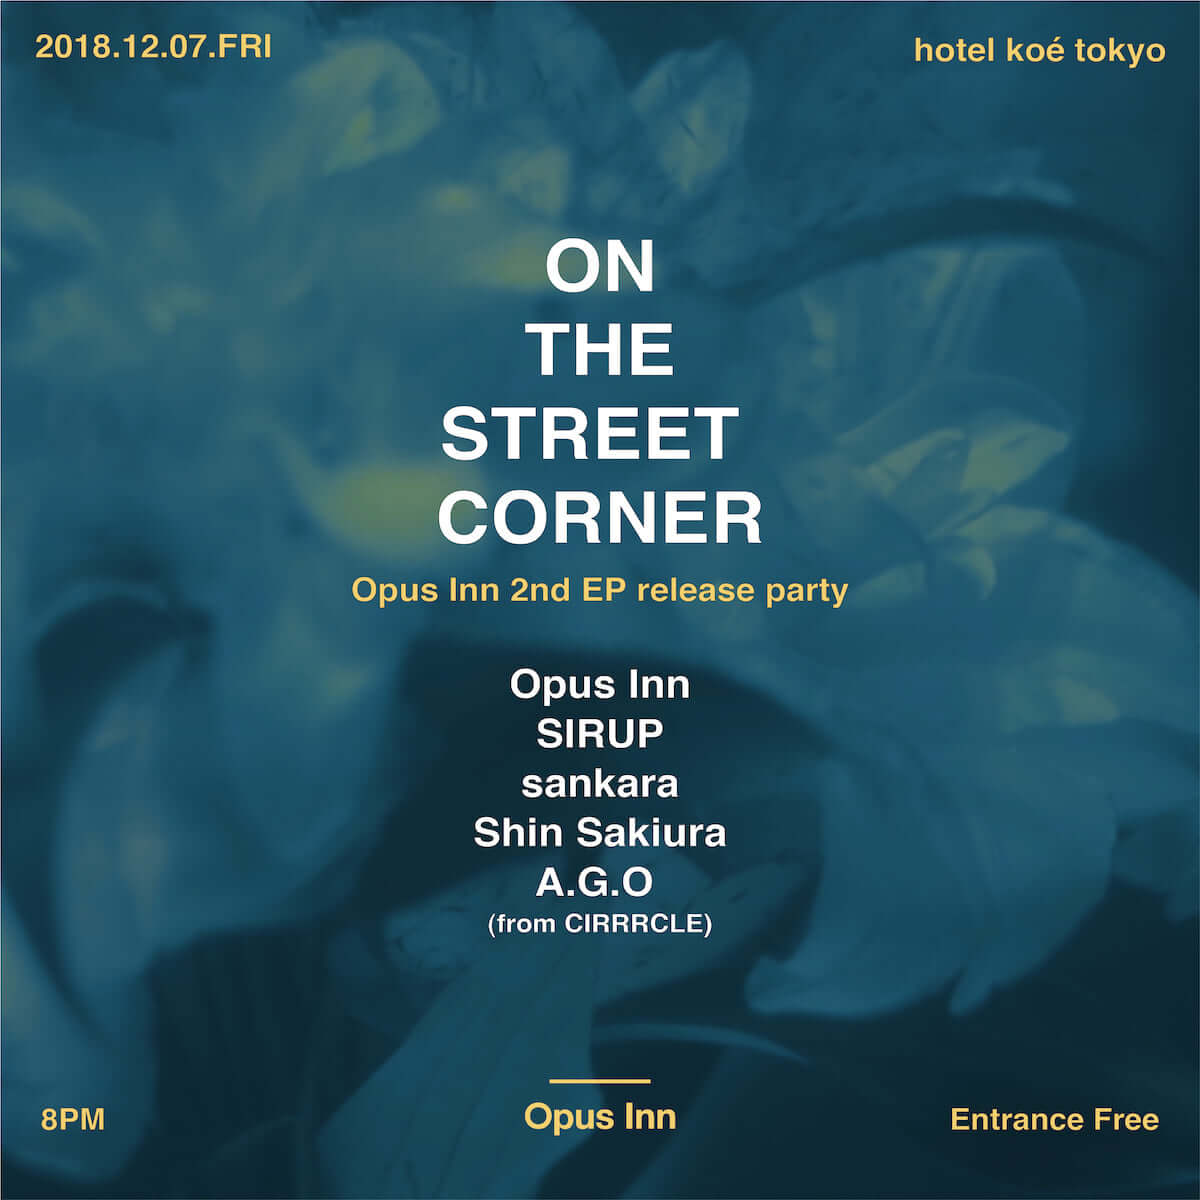 Opus InnがSIRUPをフィーチャーした楽曲「Feel It」のMVを公開 12月にはhotel koé tokyoにてリリパも開催 music181115-opusinn-3-1200x1200